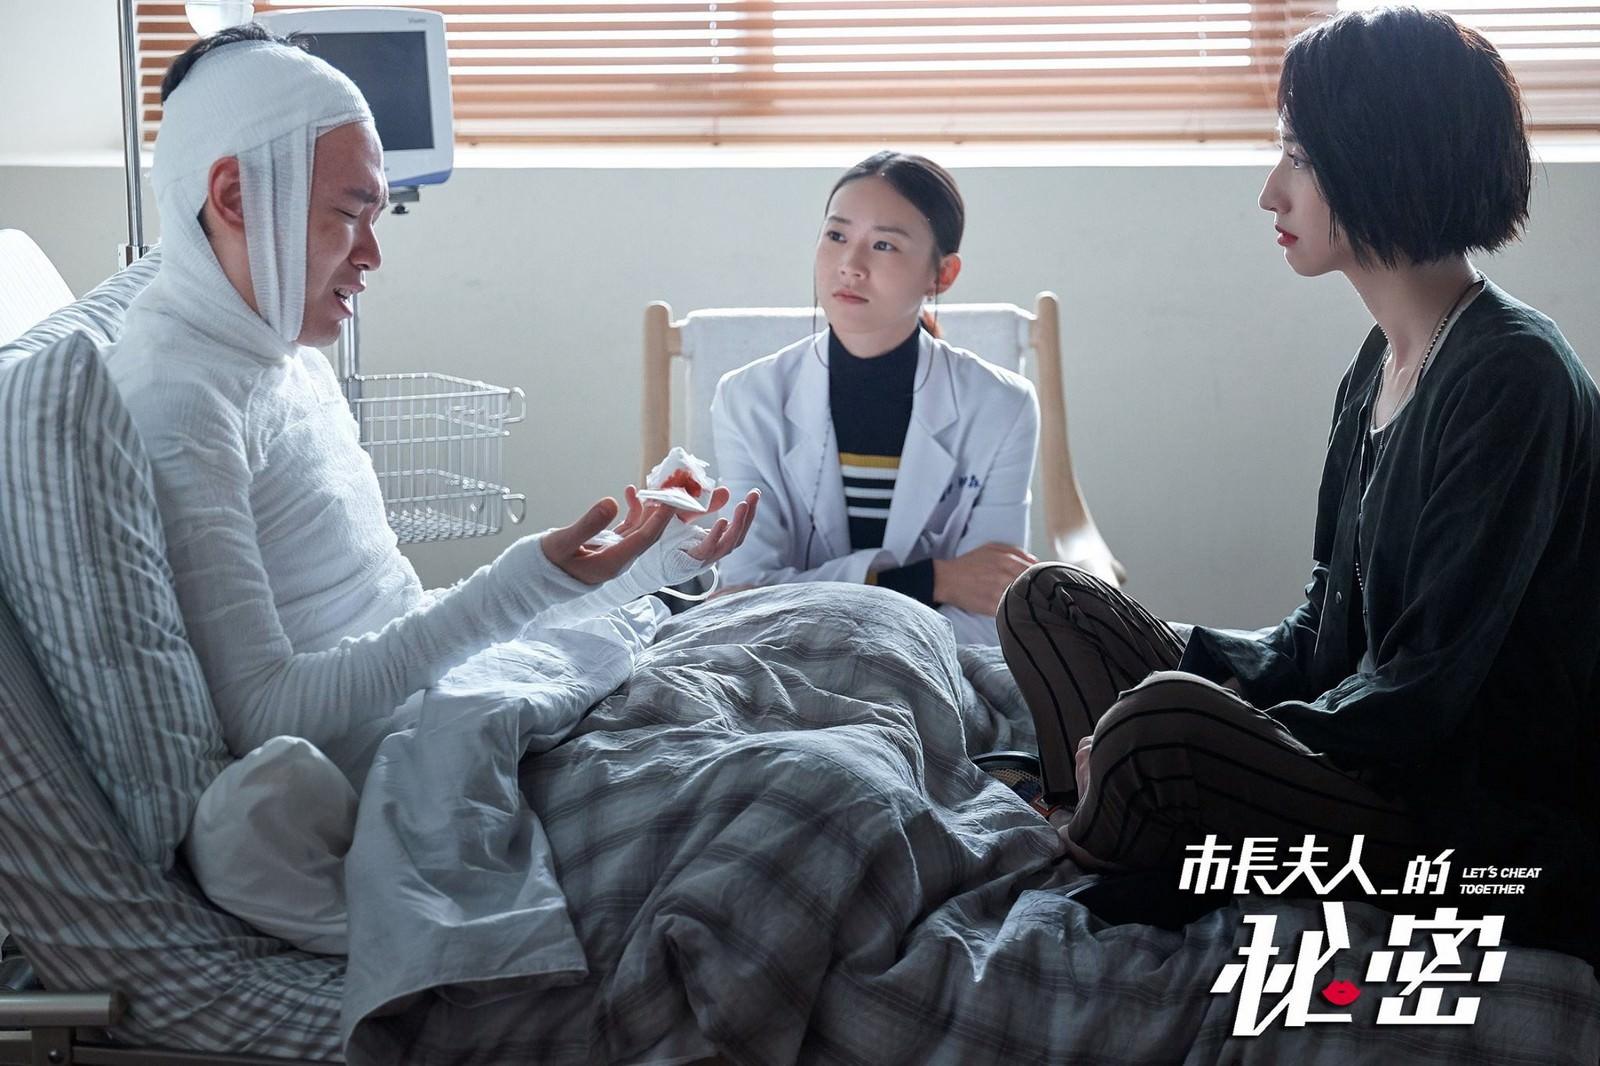 Movie, 市長夫人的秘密(台灣) / Let's Cheat Together(英文), 電影劇照